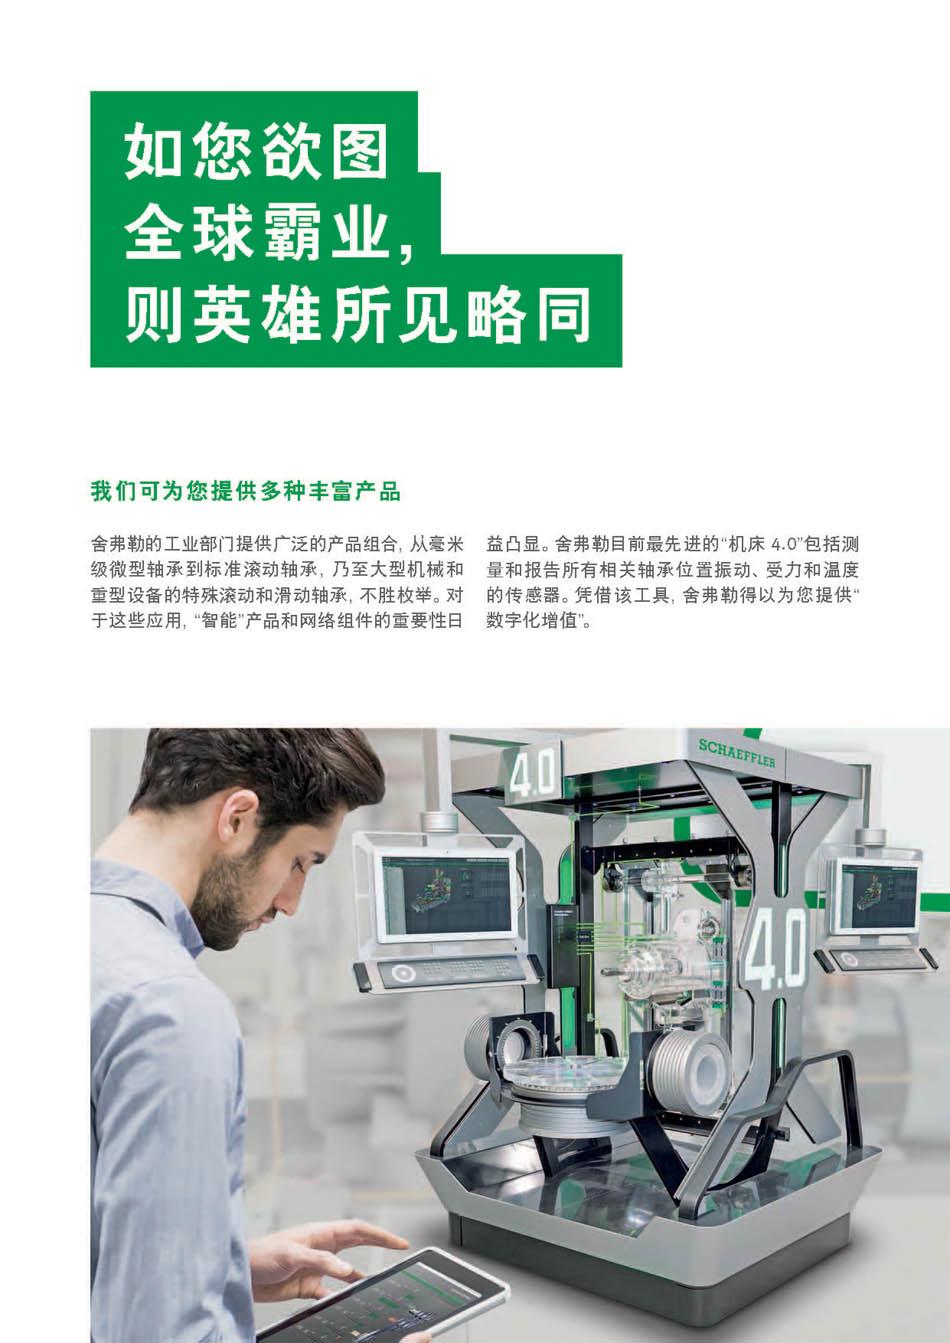 Brochure_GenerationC_CN_lowres4 (2)_页面_11.jpg